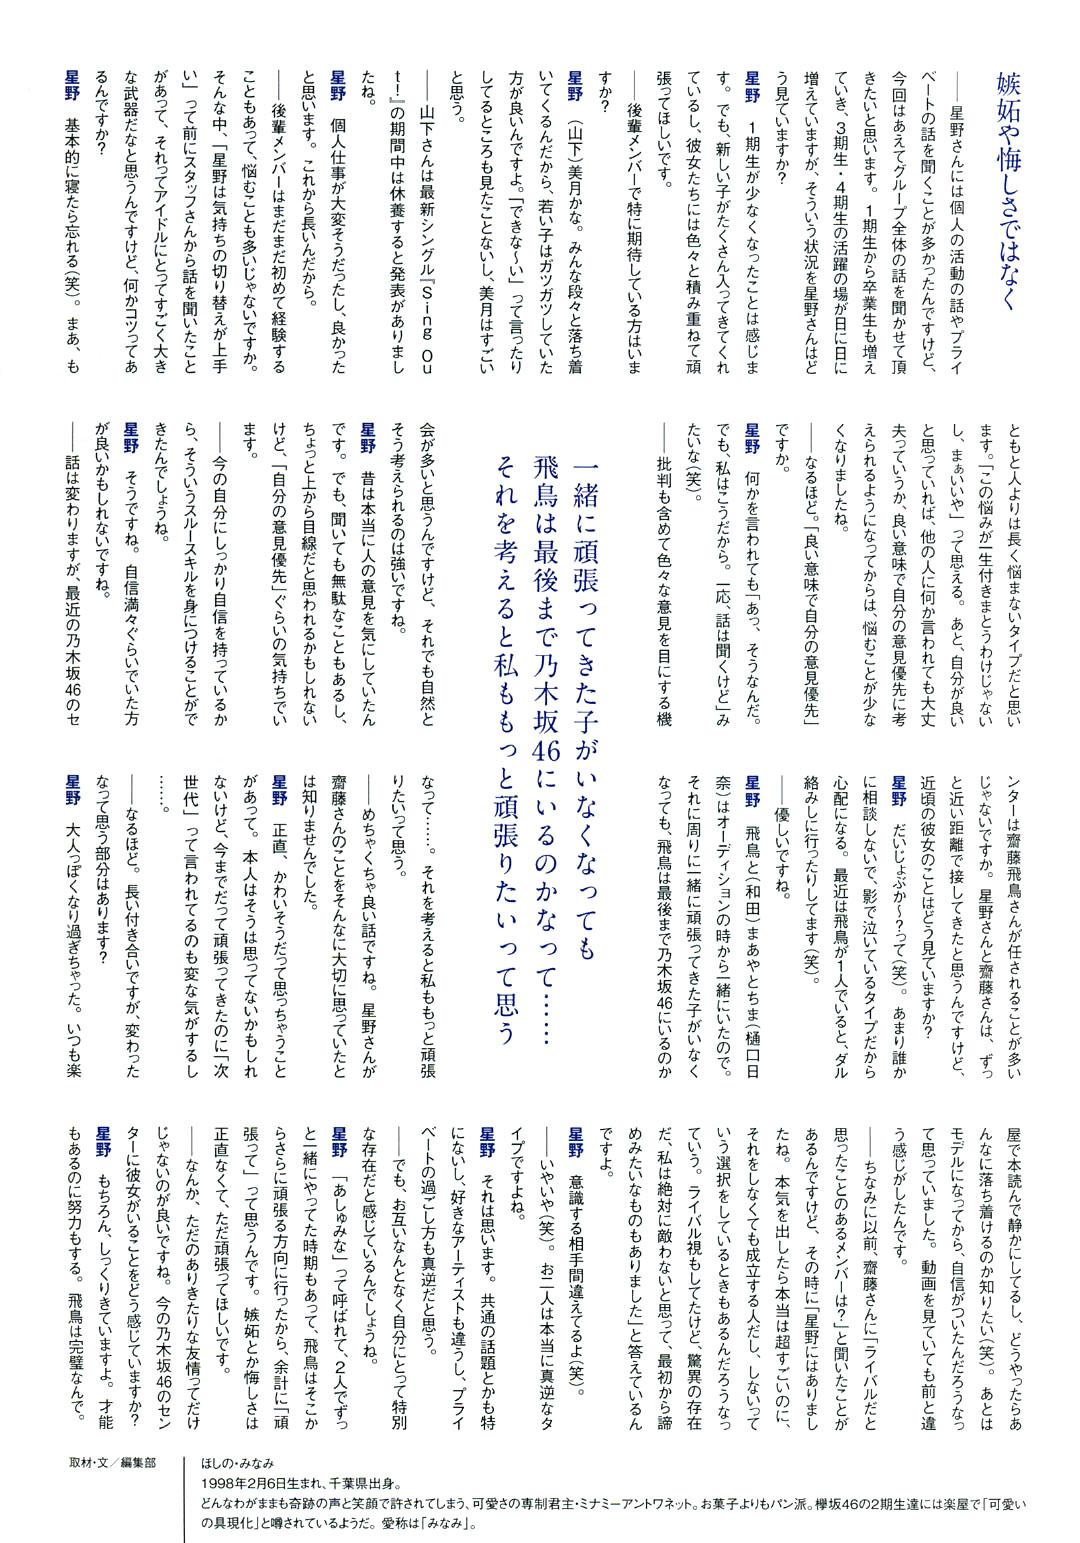 MHoshino Bubka 1907 09.jpg